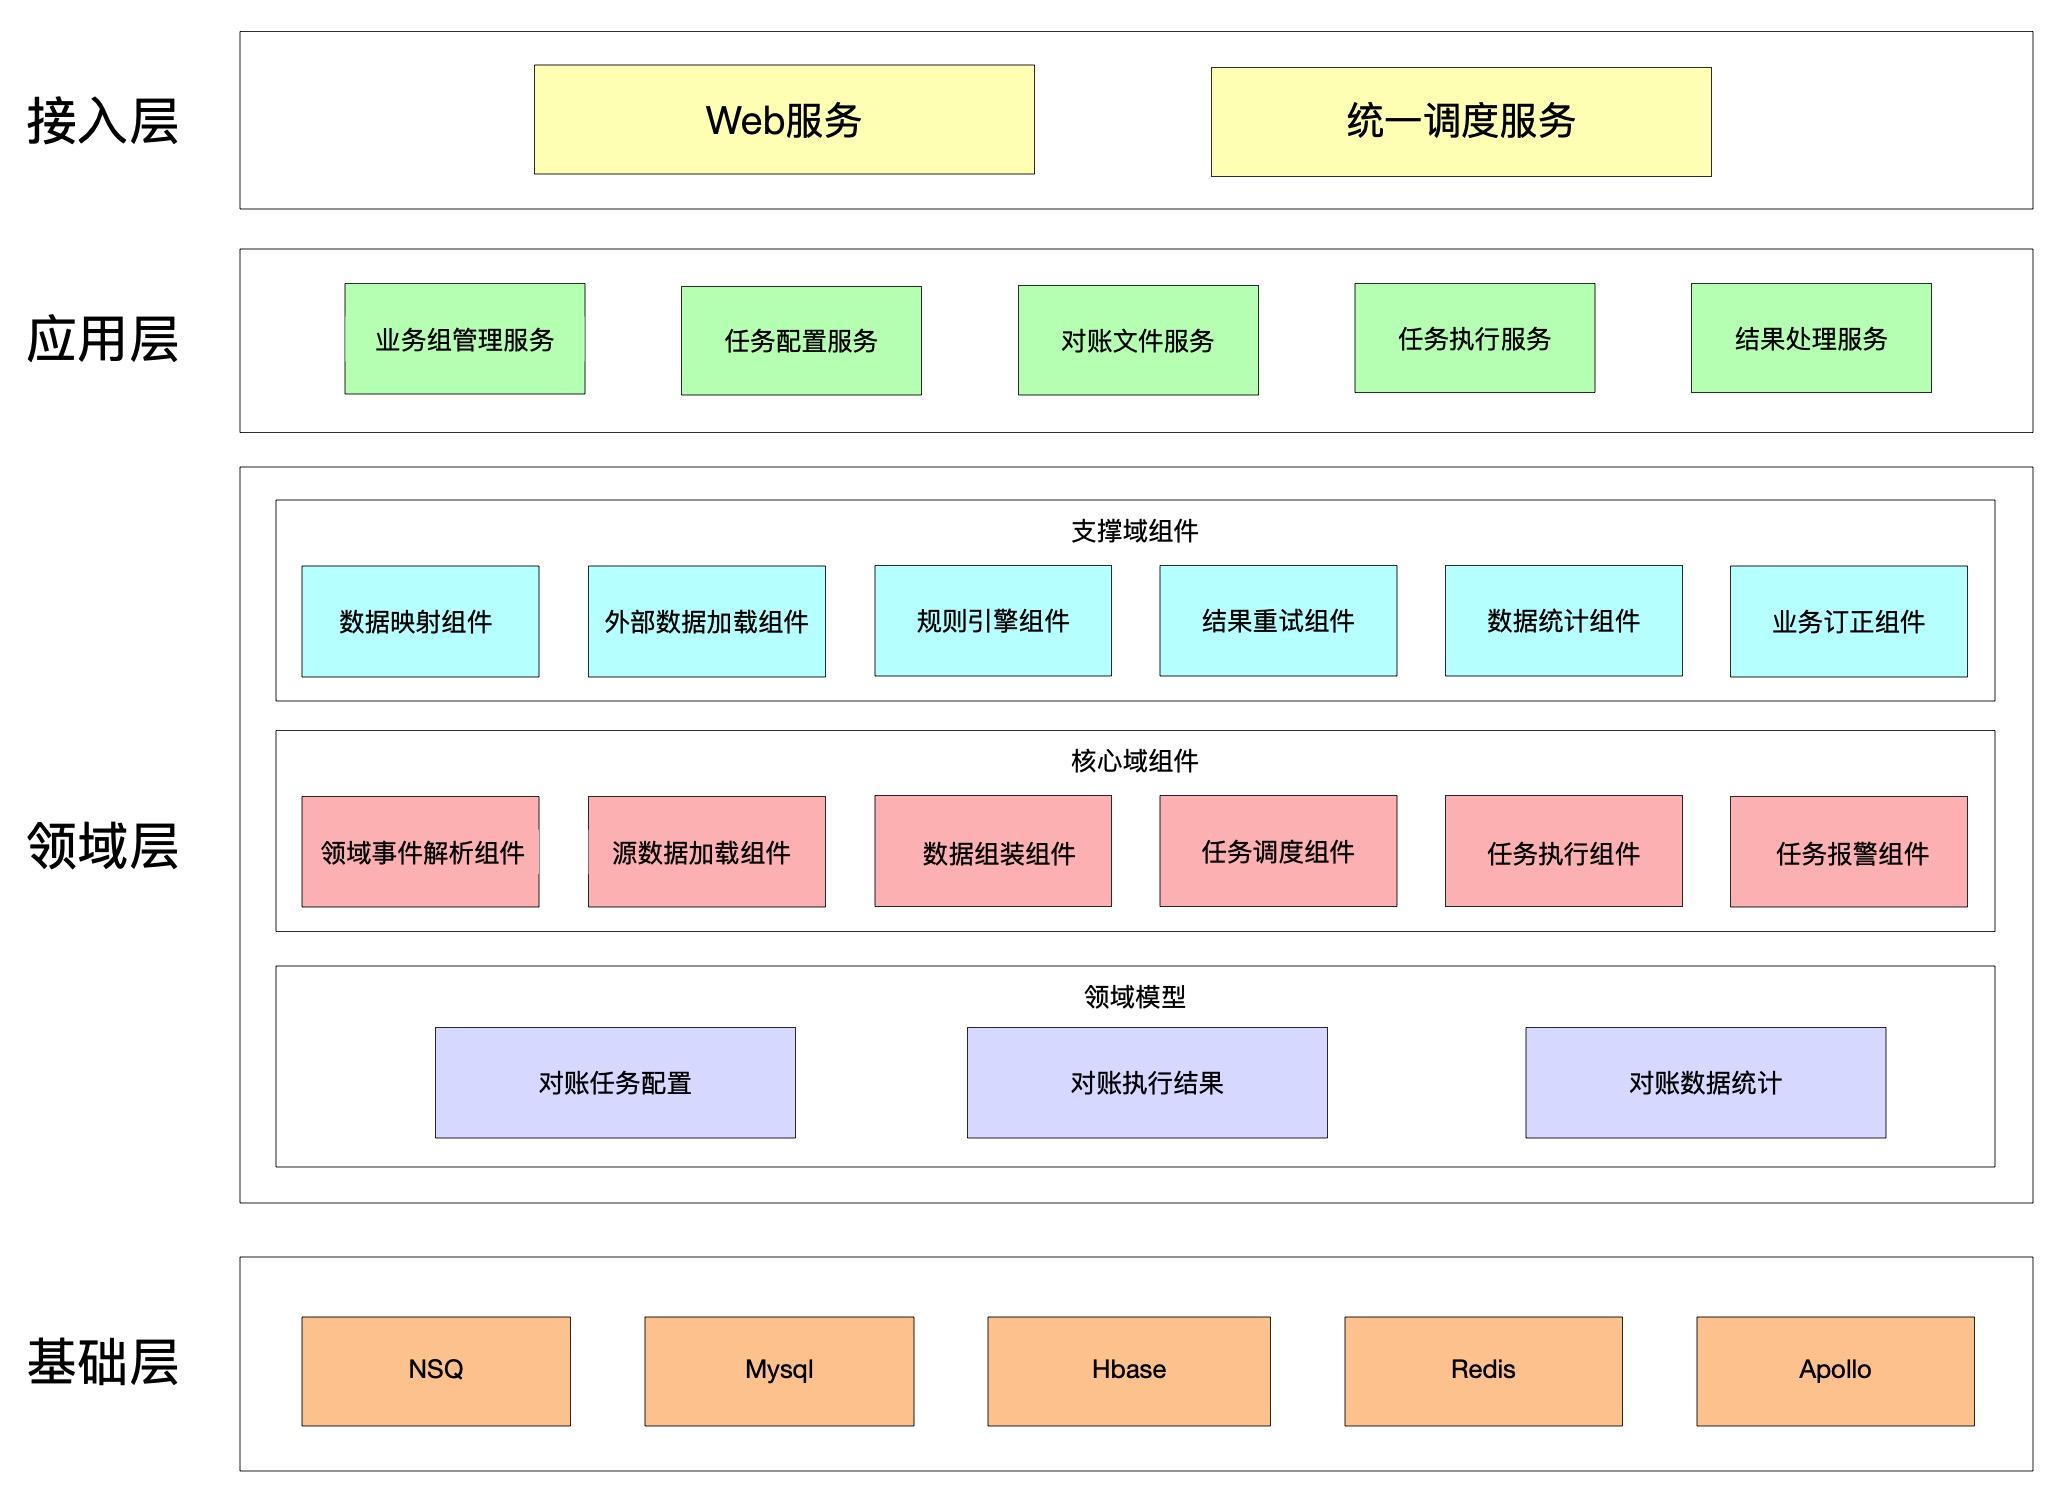 整体结构图